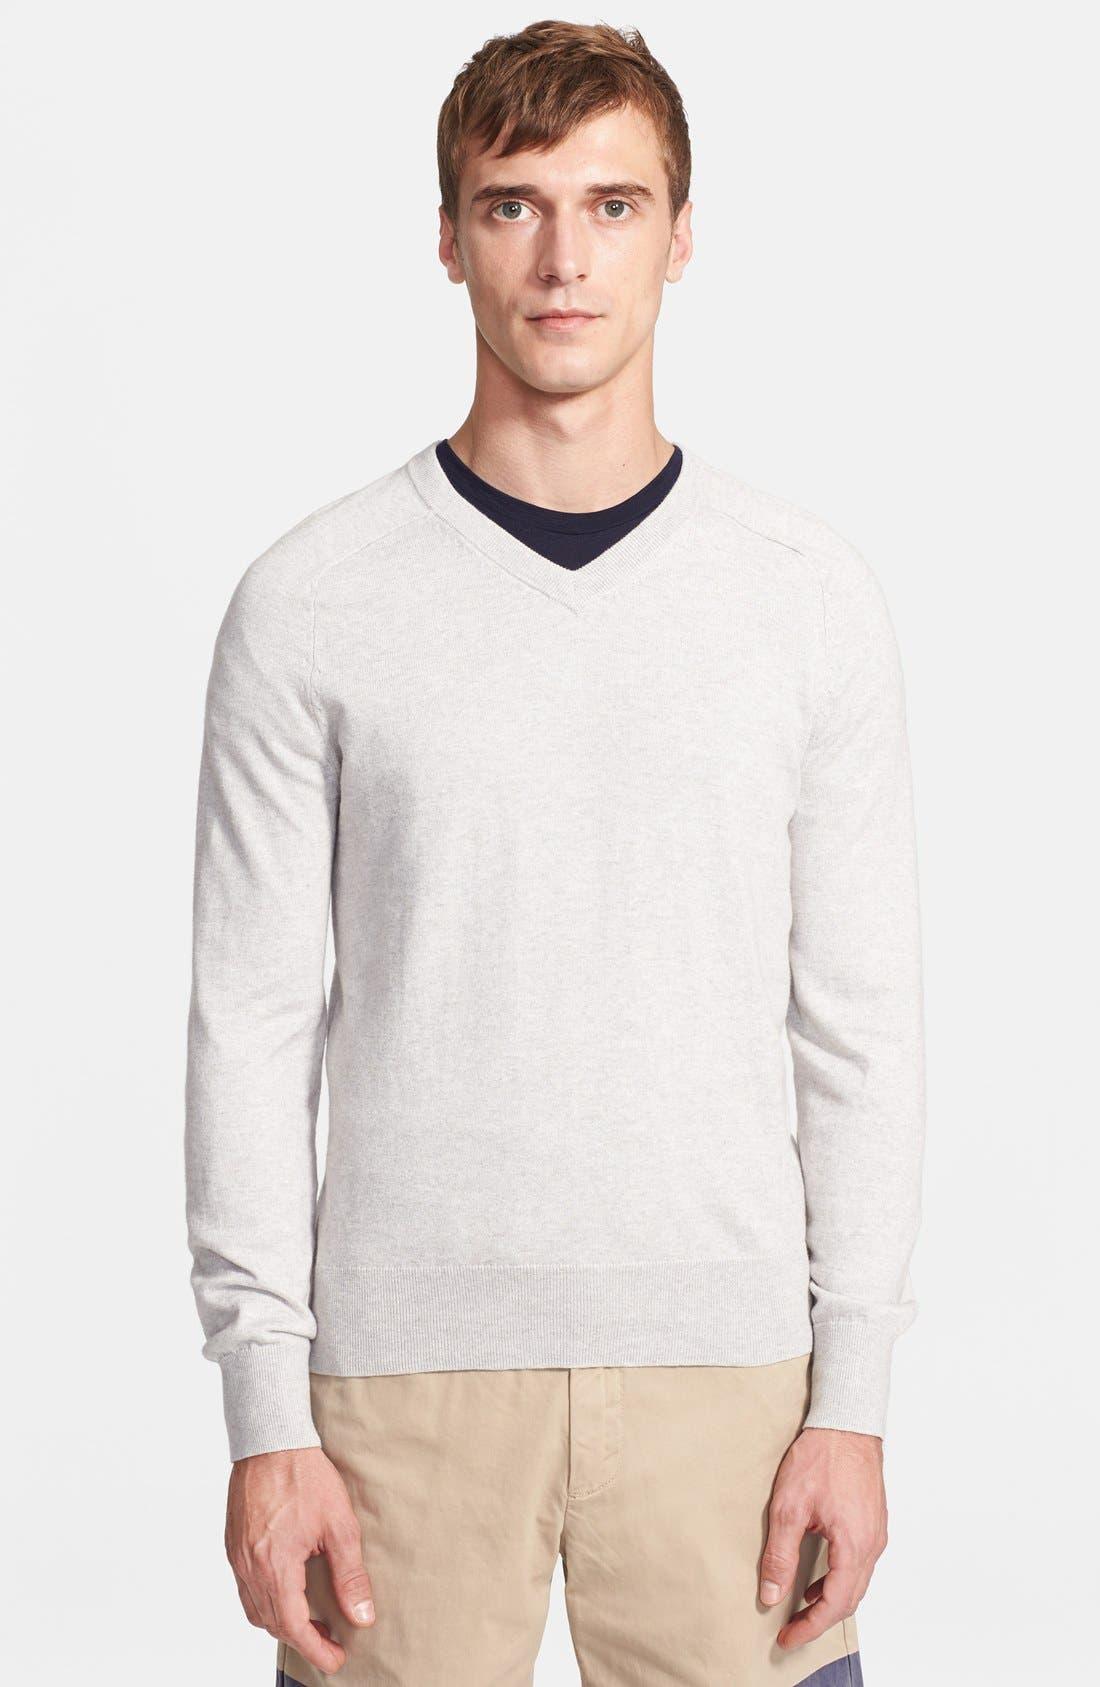 Main Image - Jack Spade 'Buckley' V-Neck Sweater